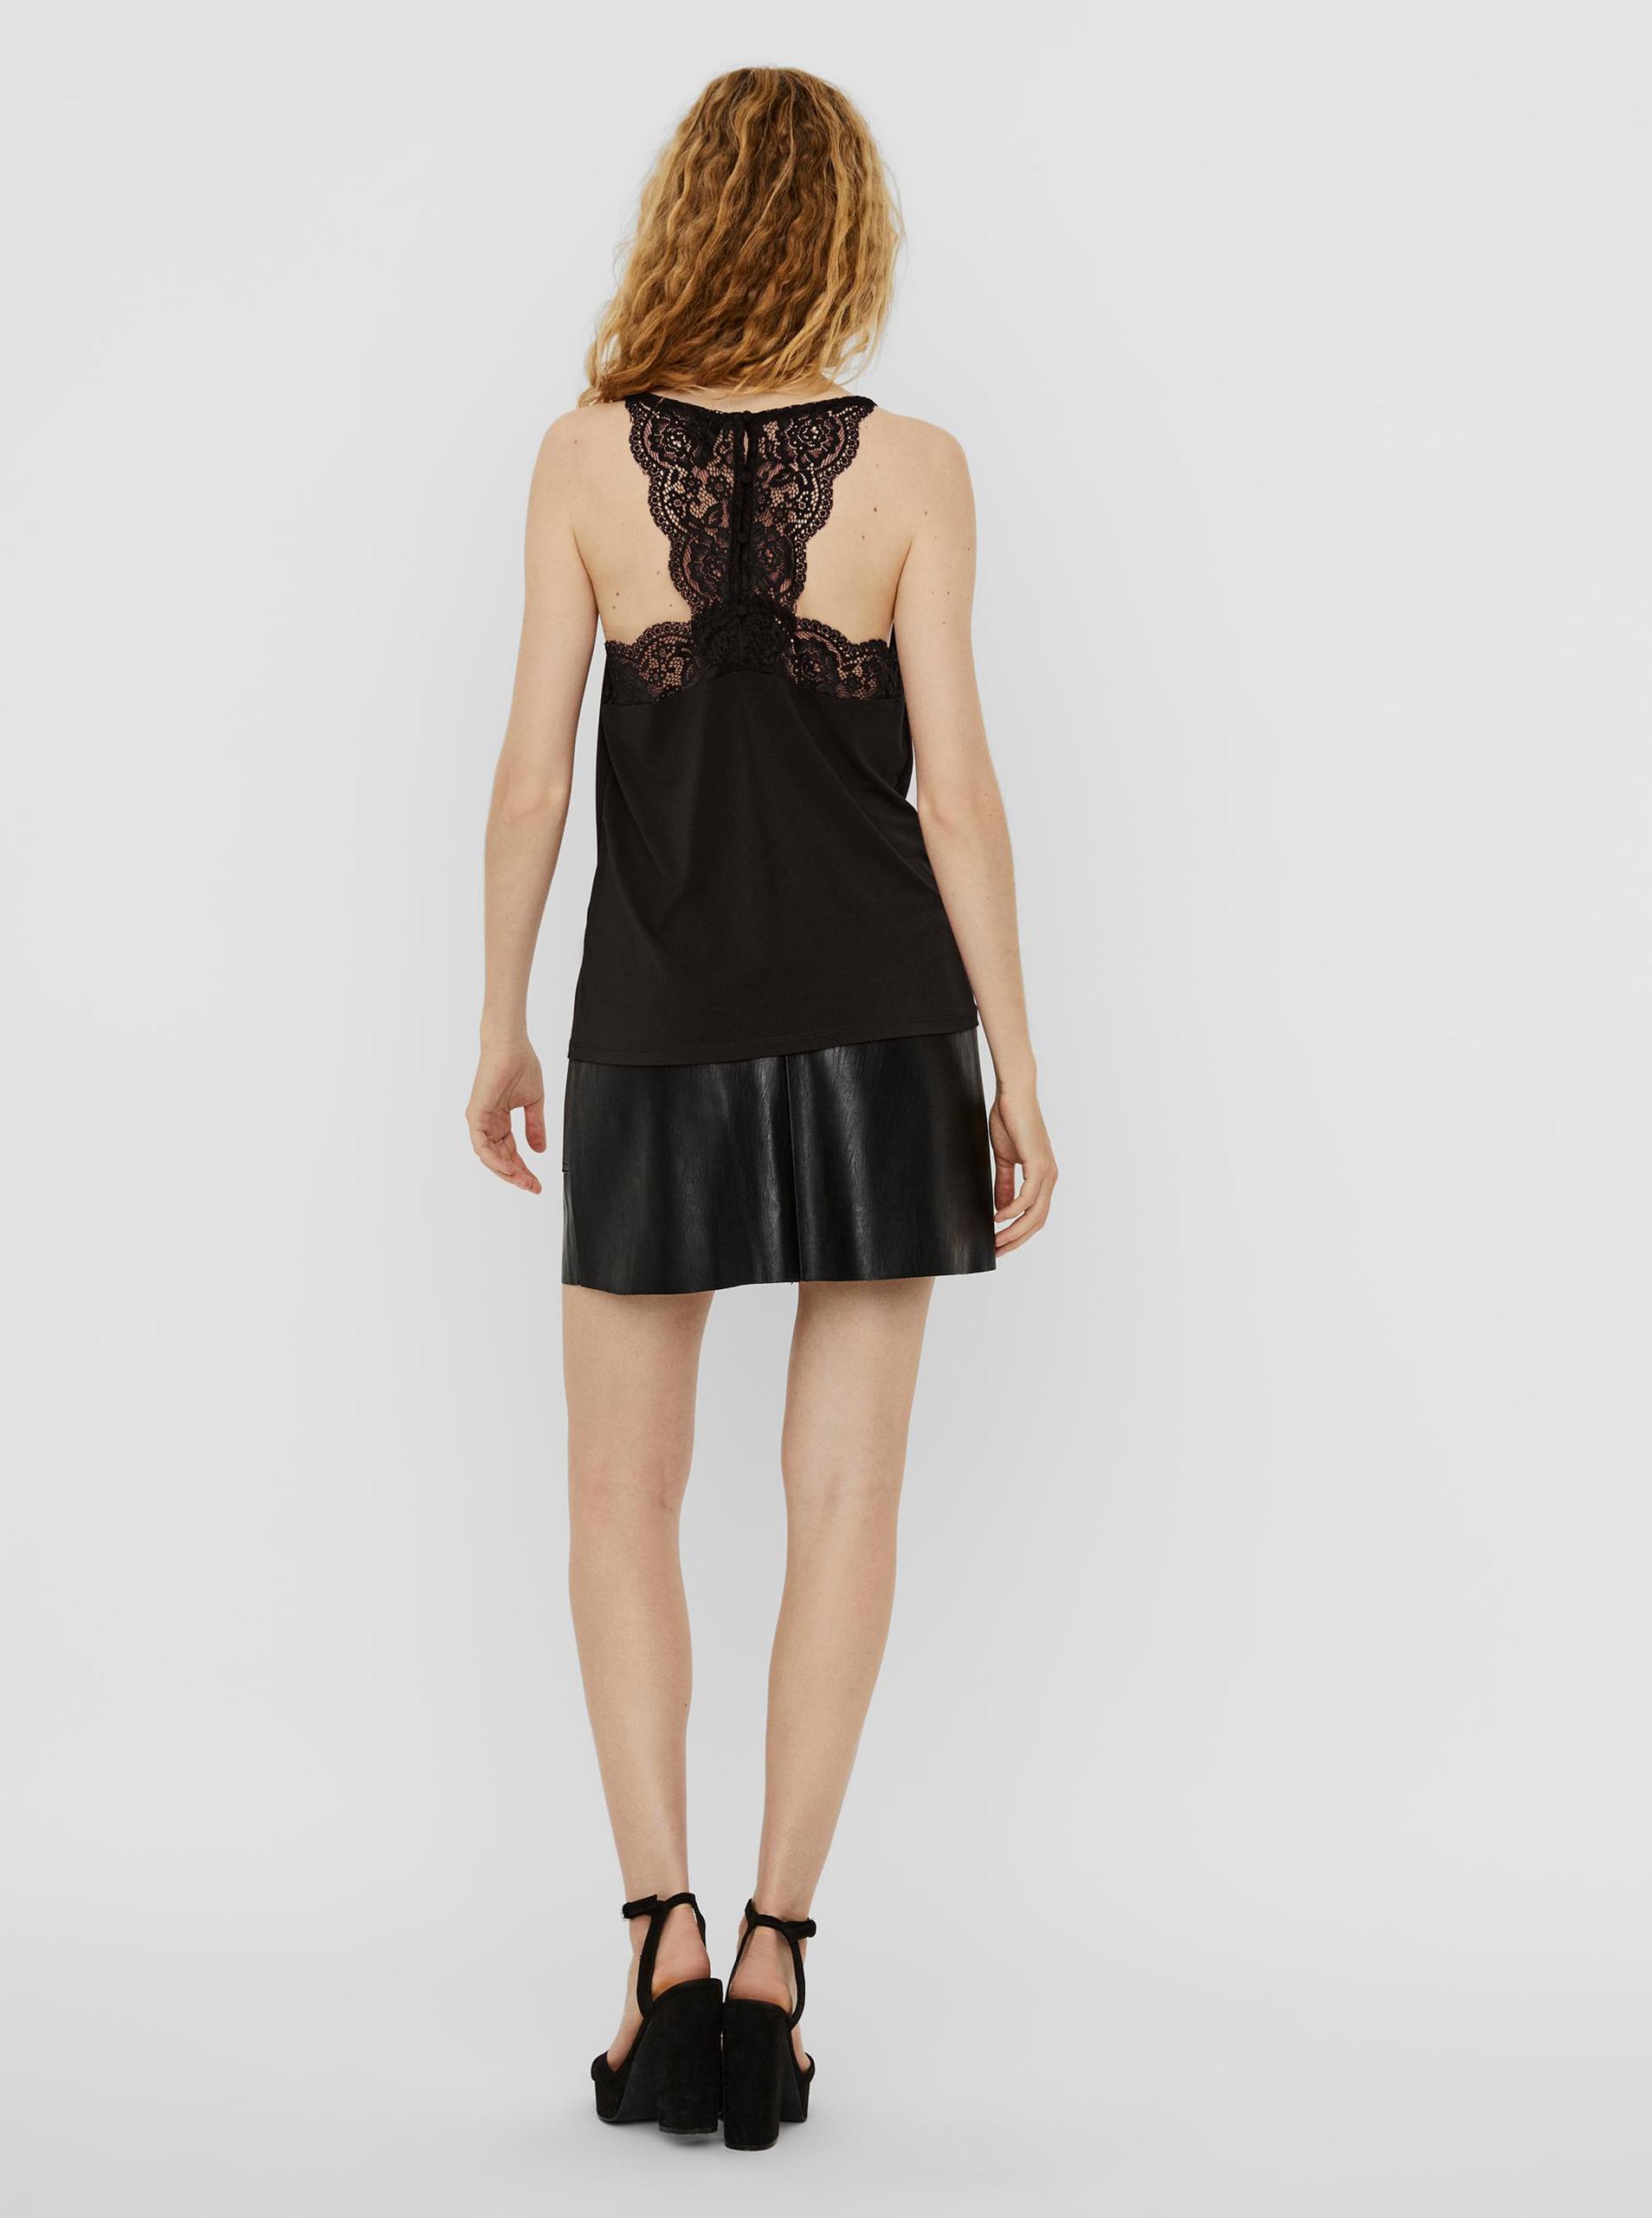 Vero Moda black top Ana